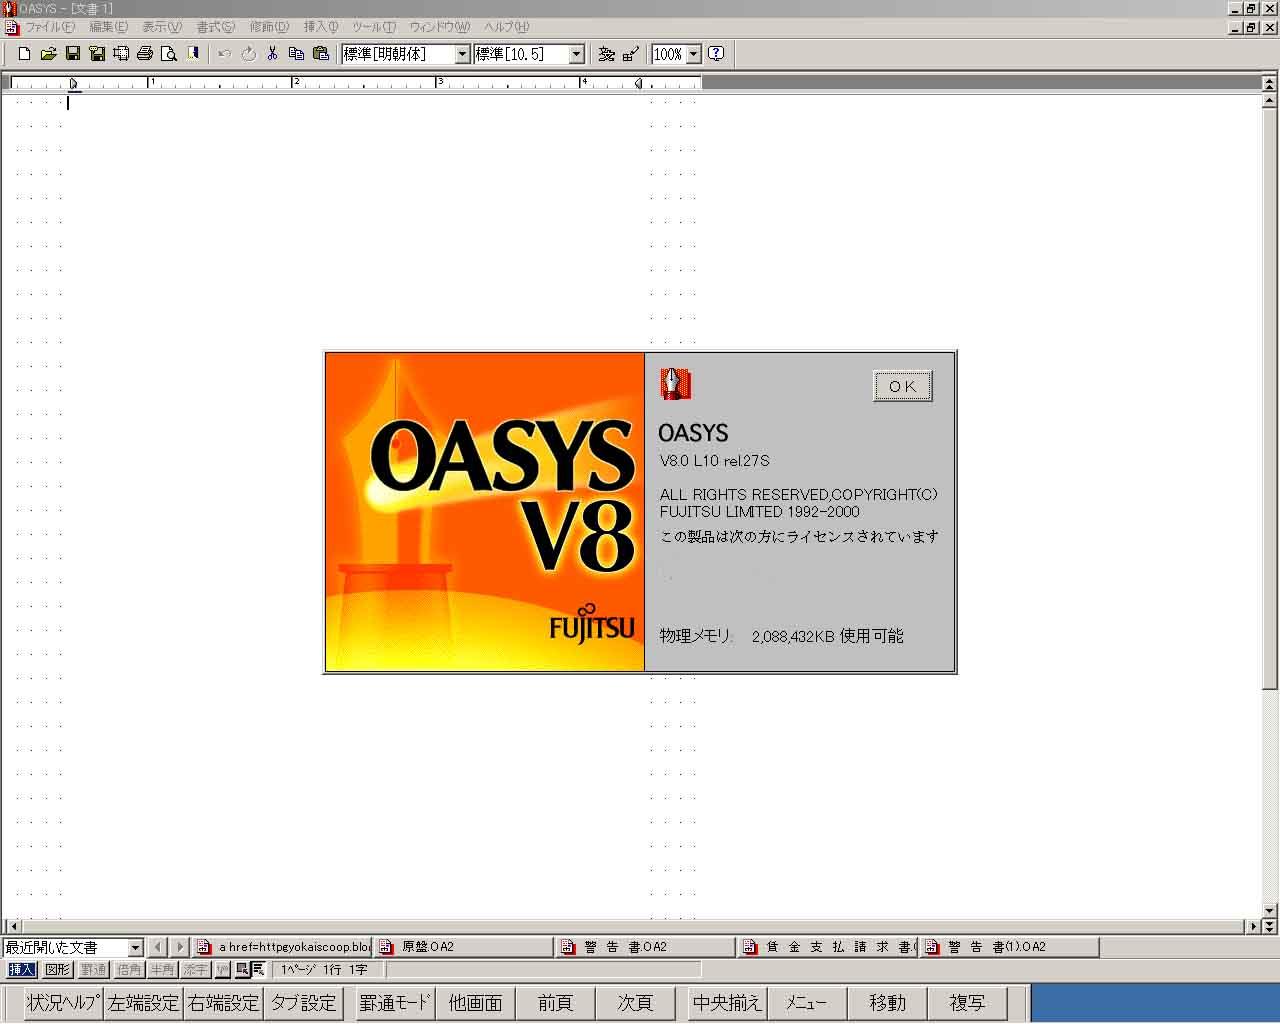 OASYS画面1 コピー